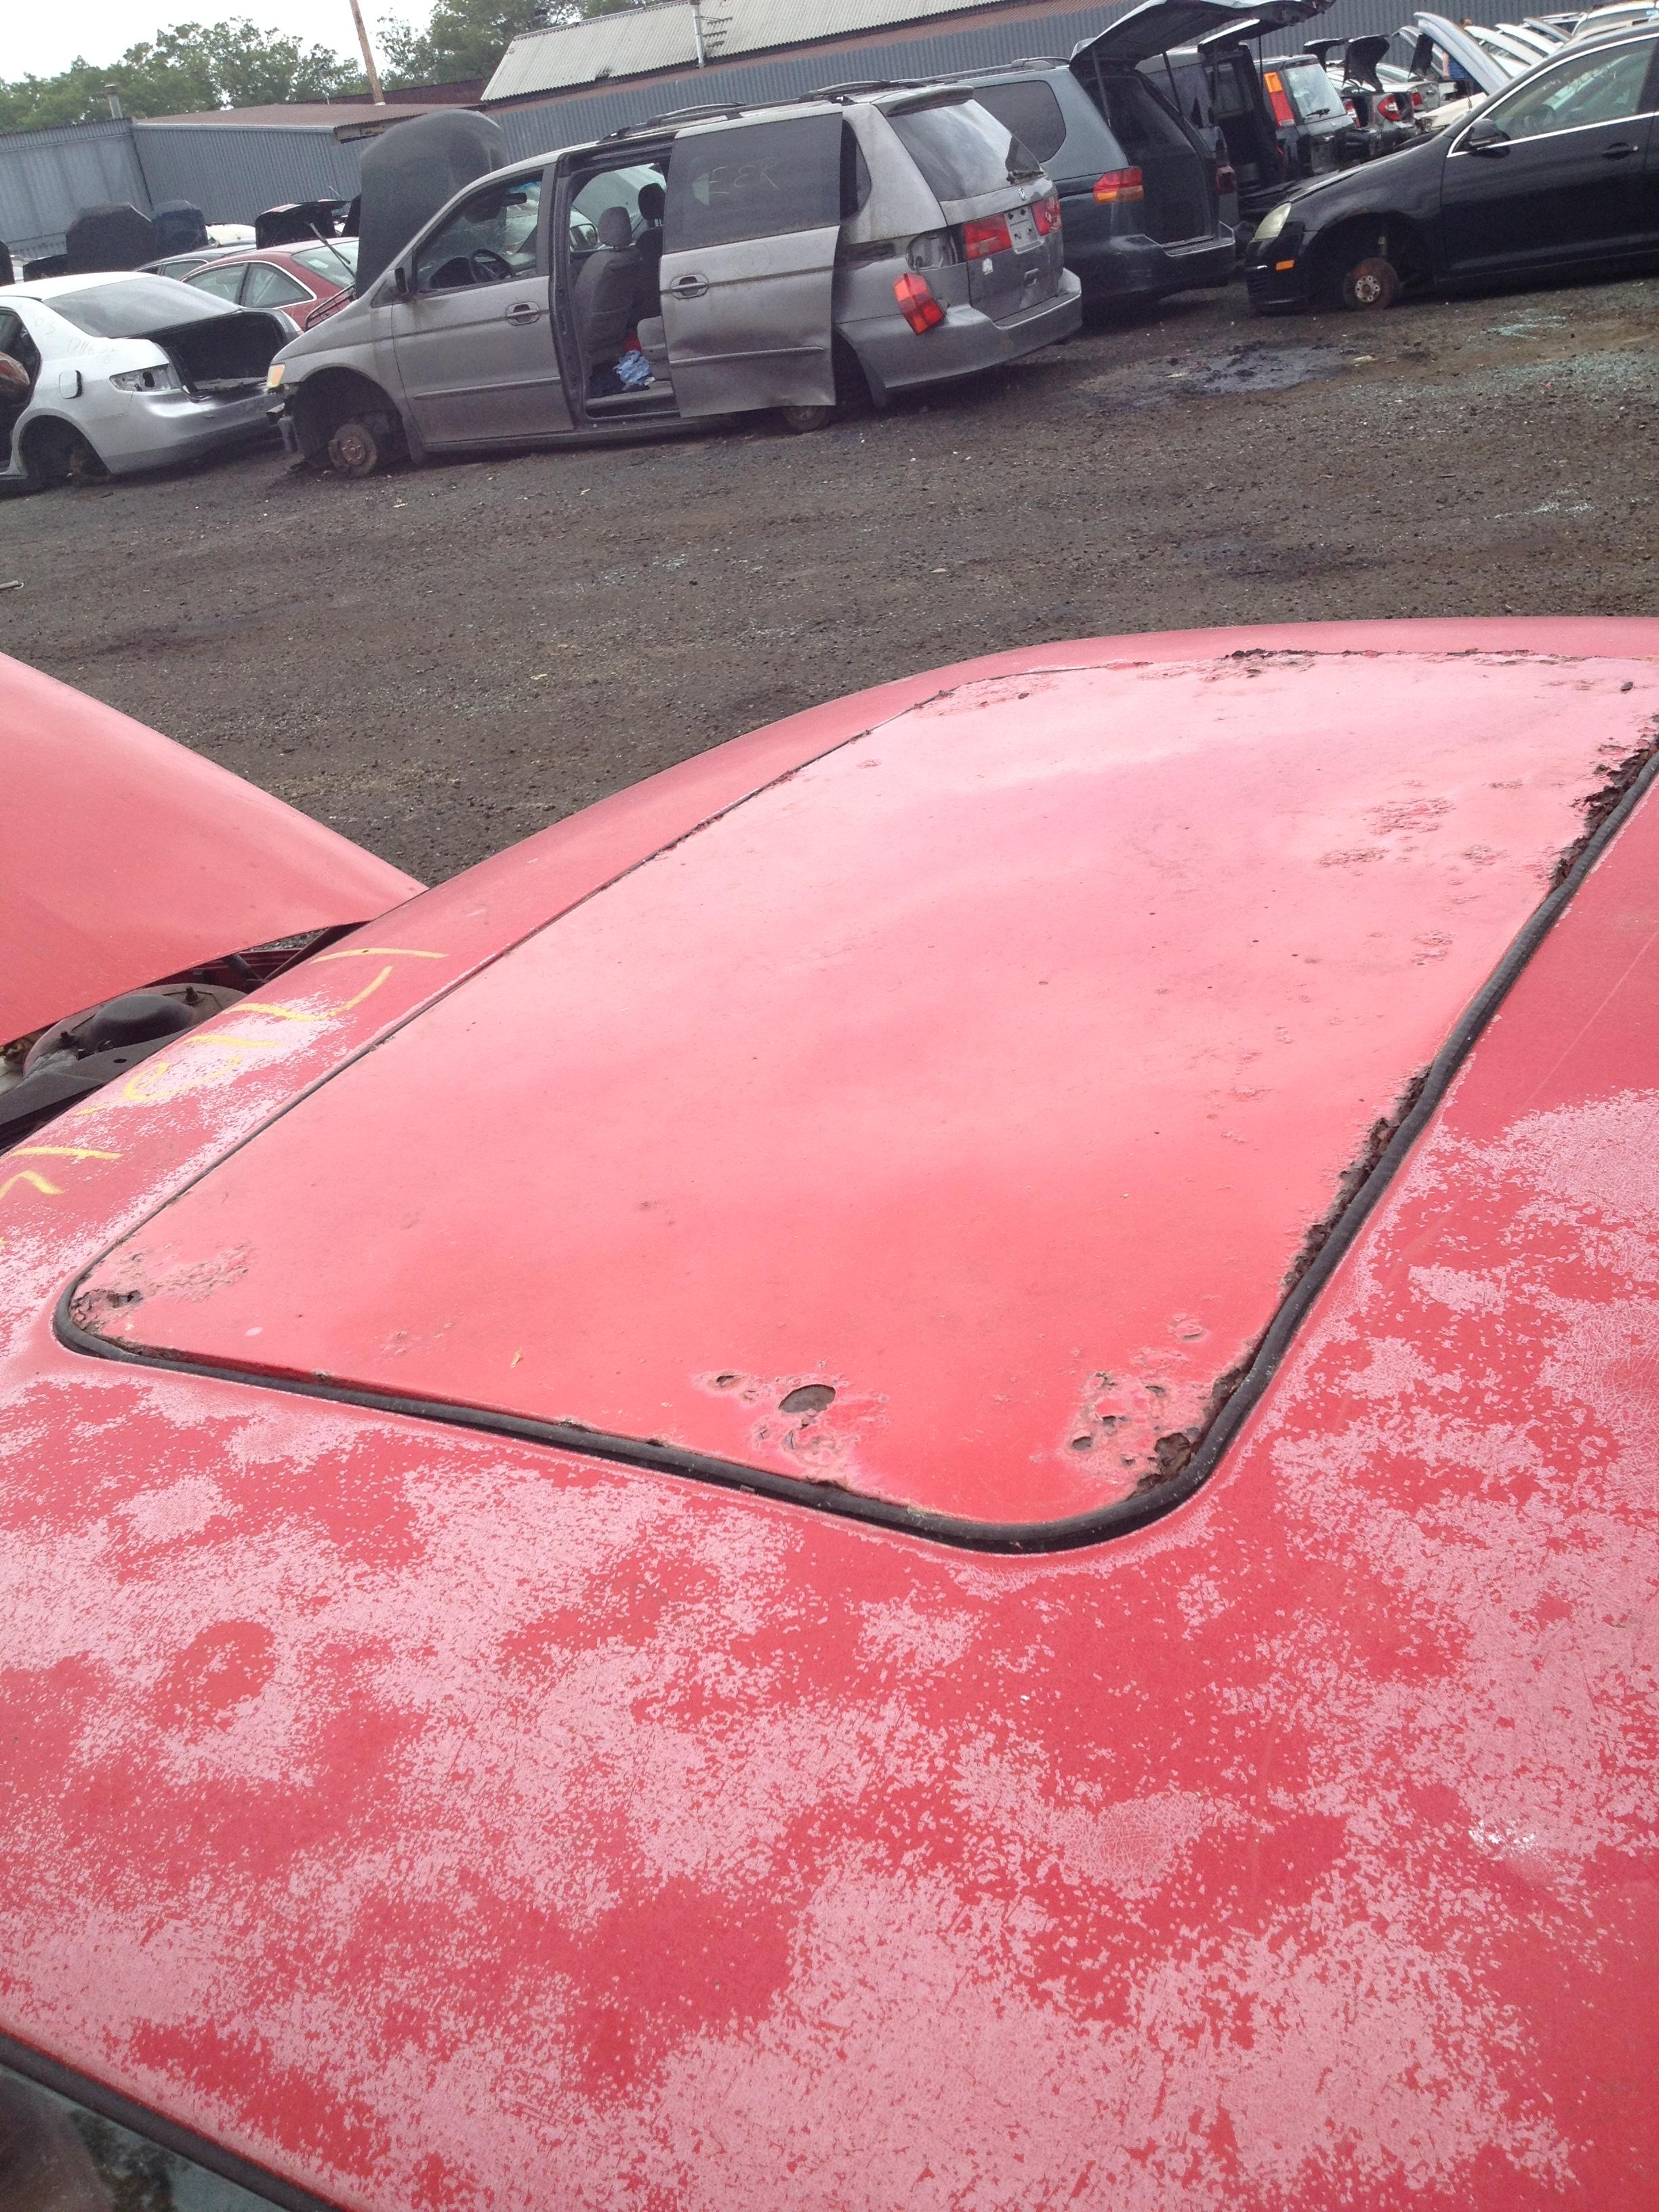 90 Reatta Coupe, Brockton, MA junkyard - Buick Reatta - Antique ...